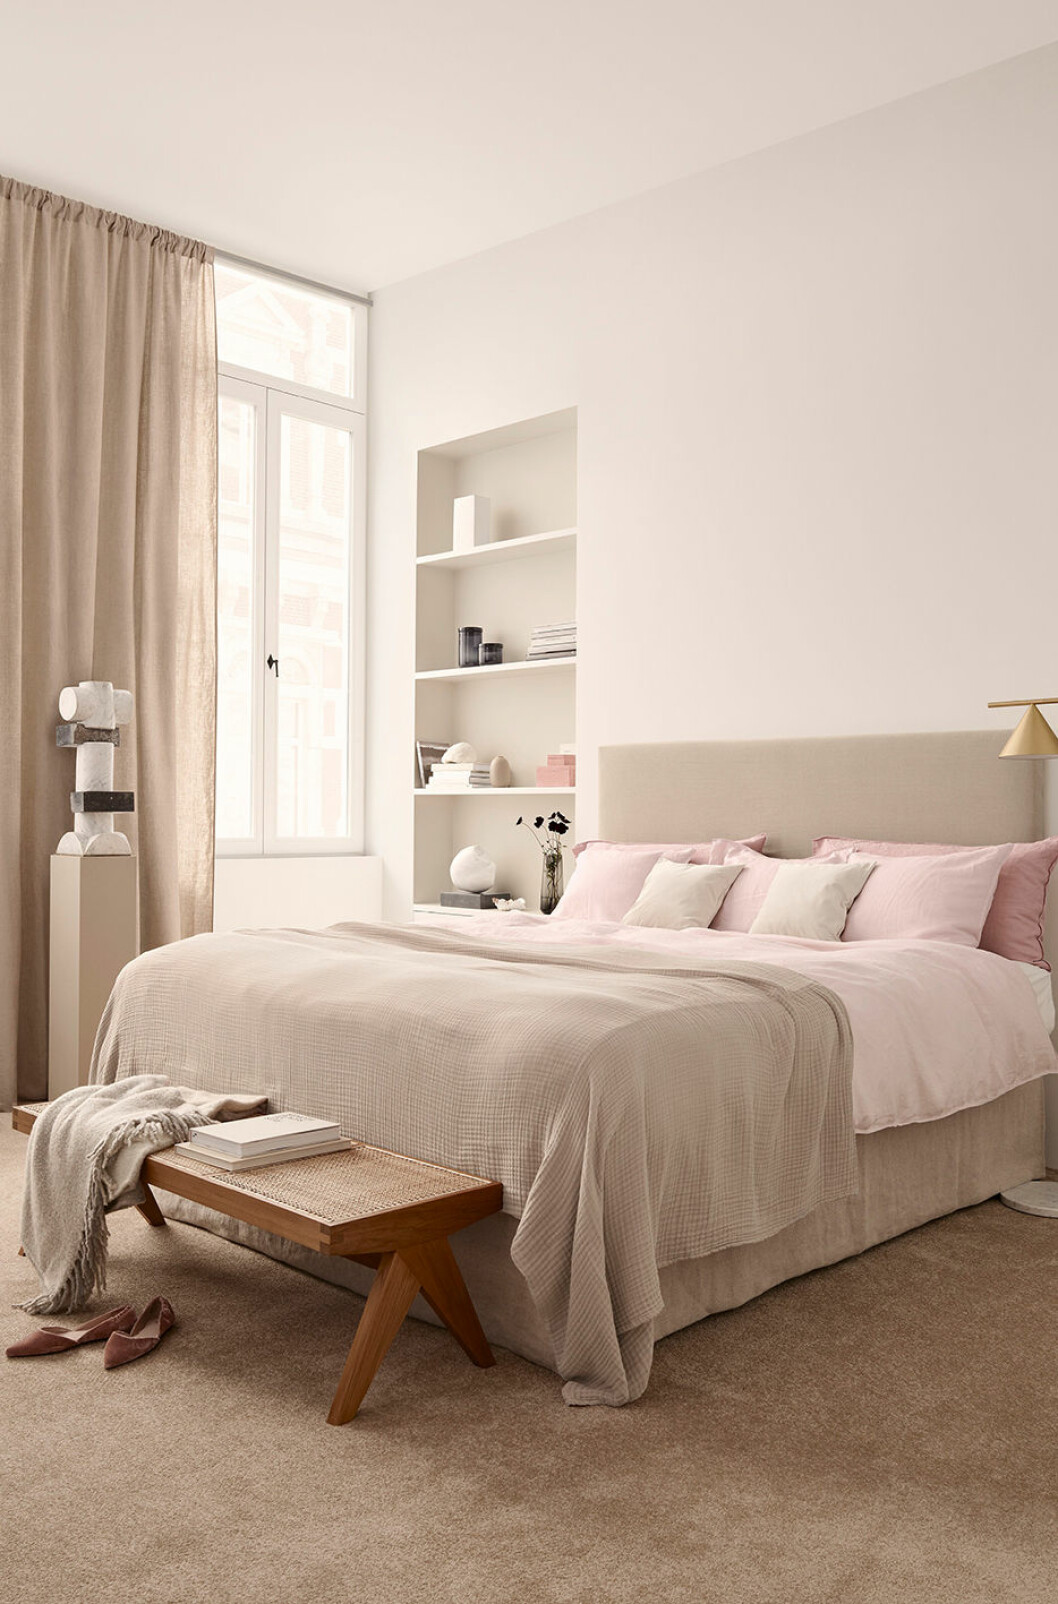 En sittbänk kan ge sovrummet en tidlös hotellkänsla.